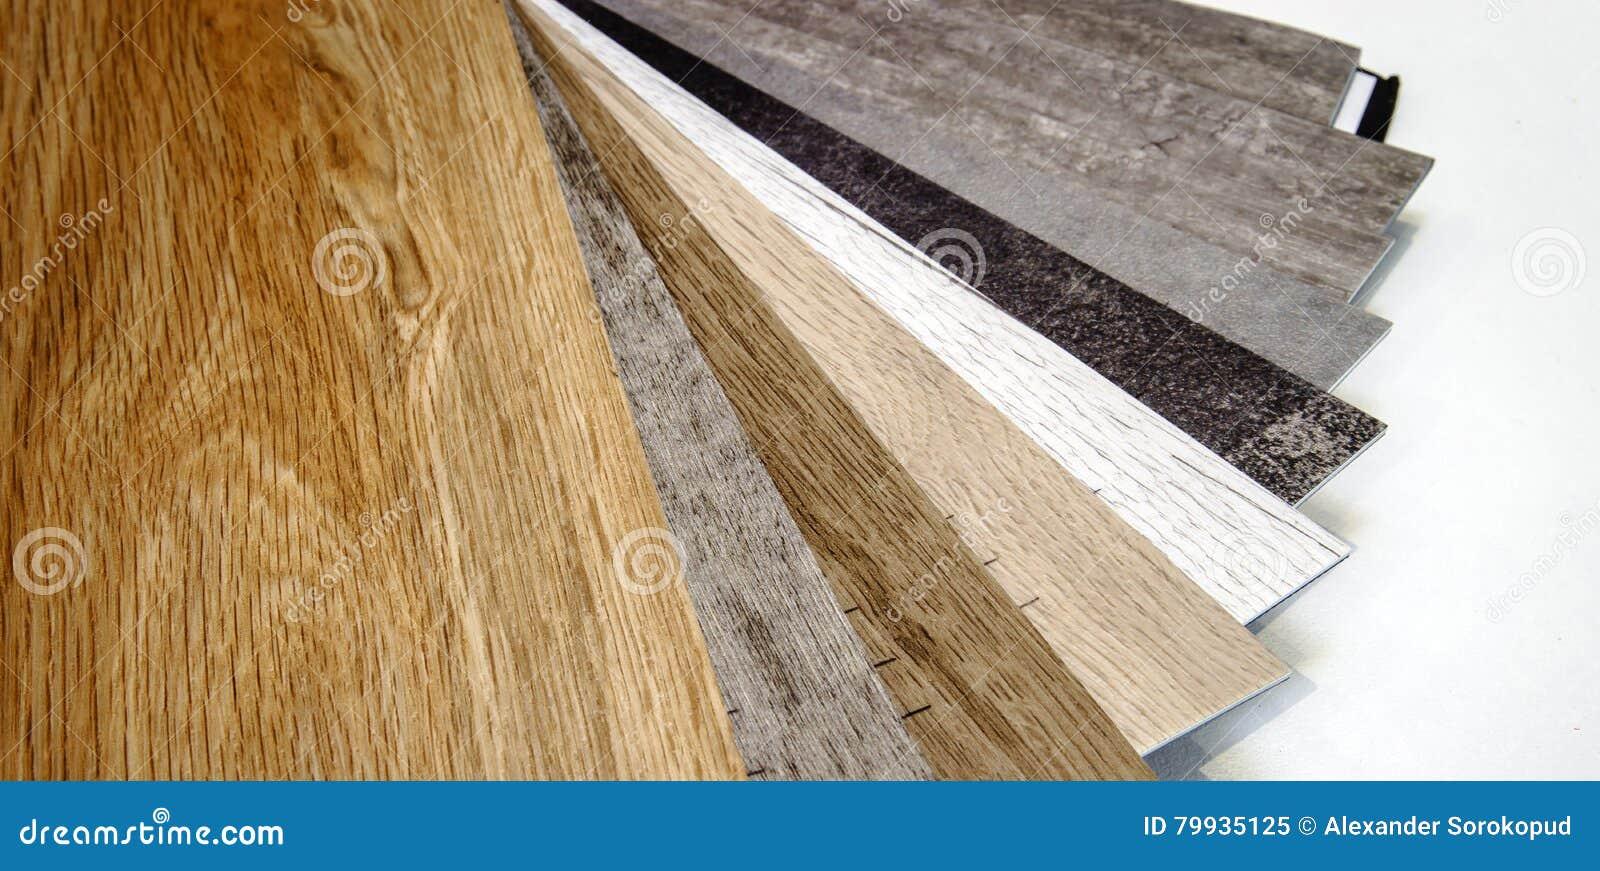 Fußbodenbelag Laminat ~ Natürliche hölzerne laminat proben für fußbodenbelag stockbild